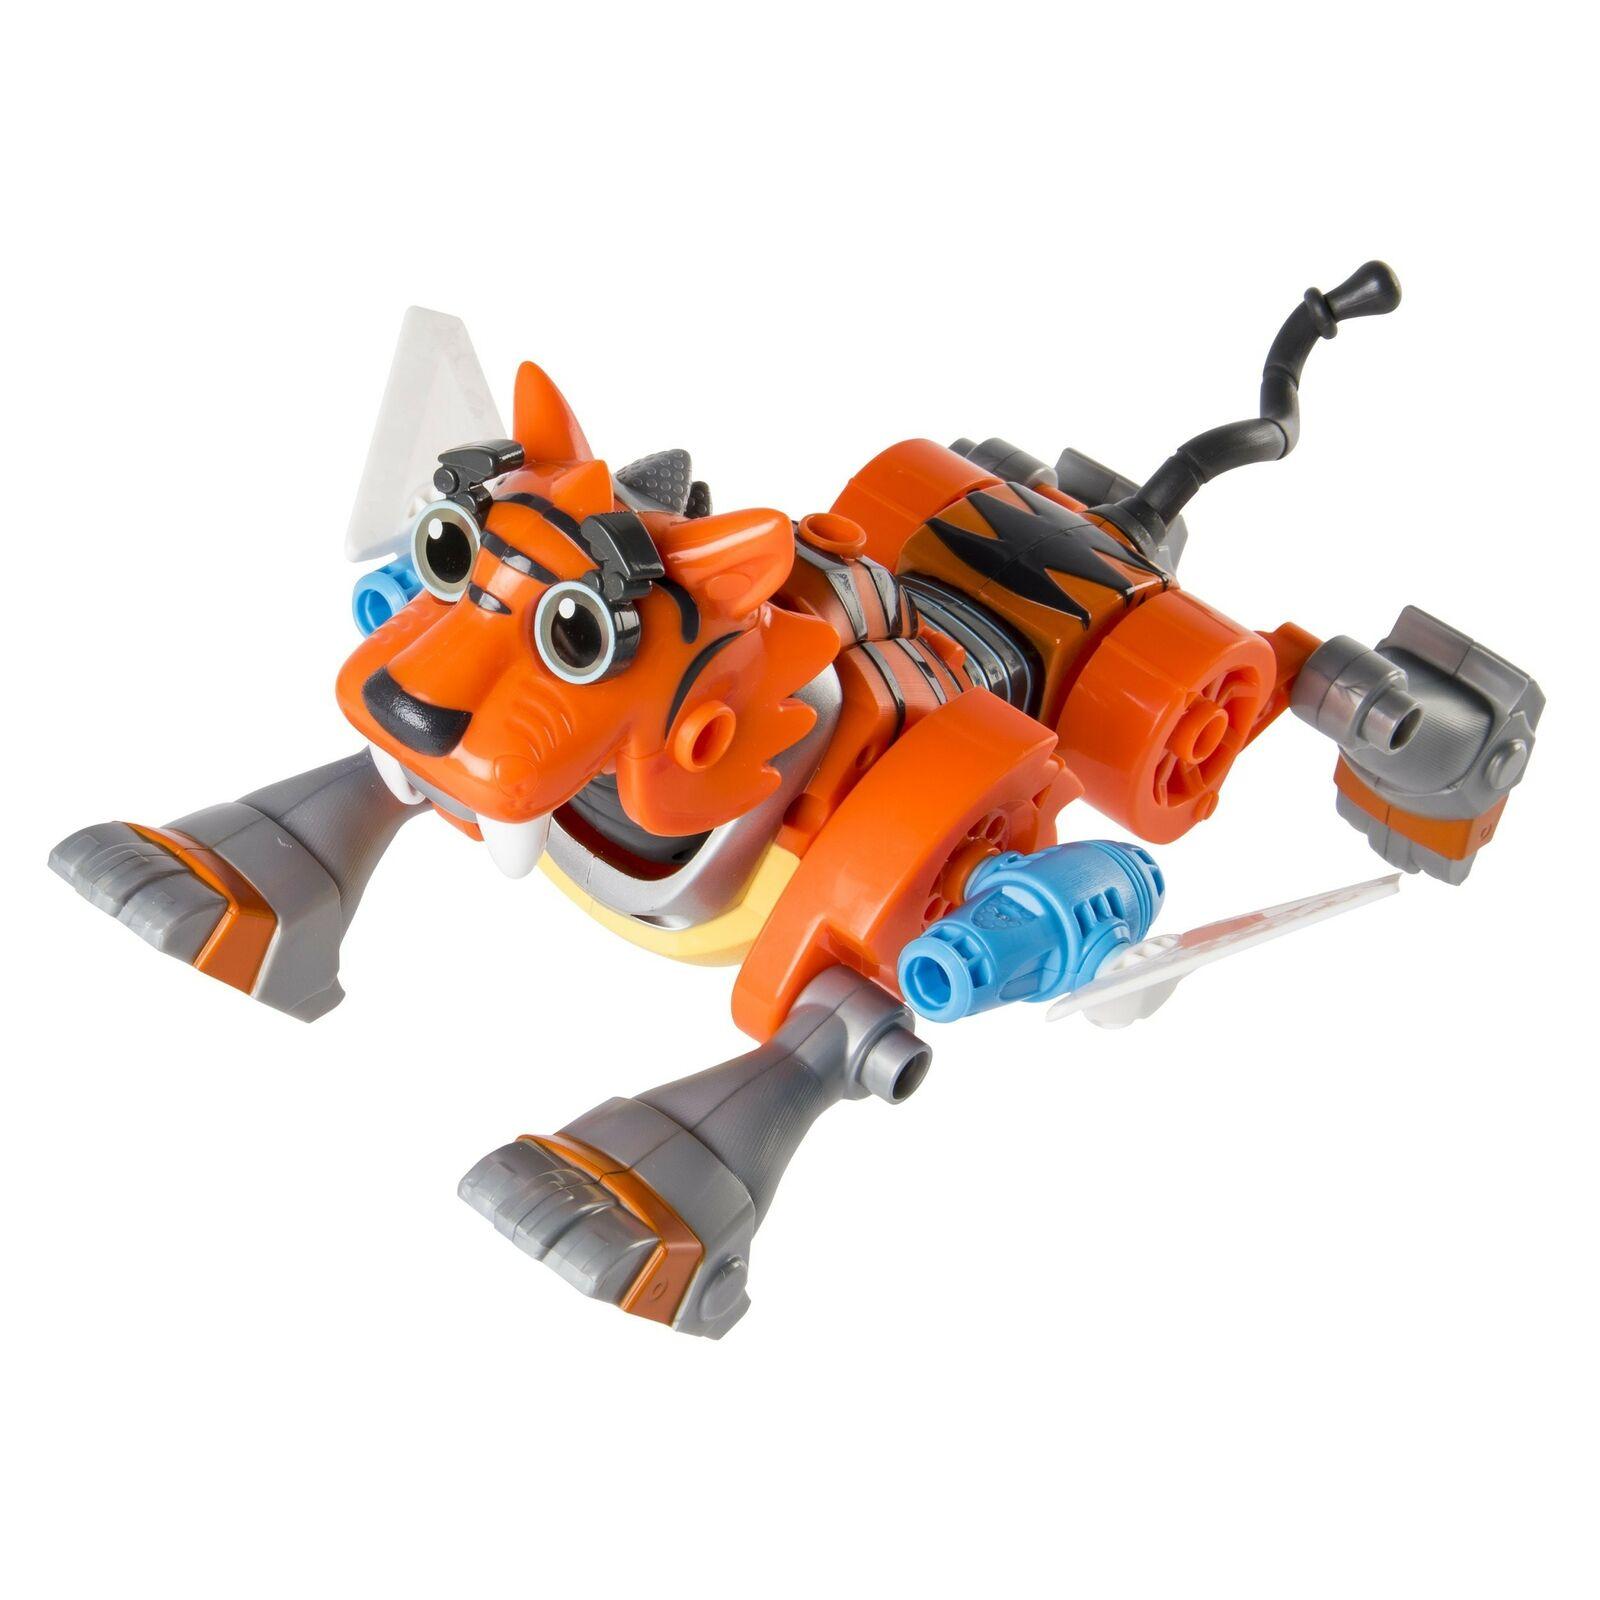 Nickelodeon Rusty Rivets Build Me Rivet System Elephantbot Figure